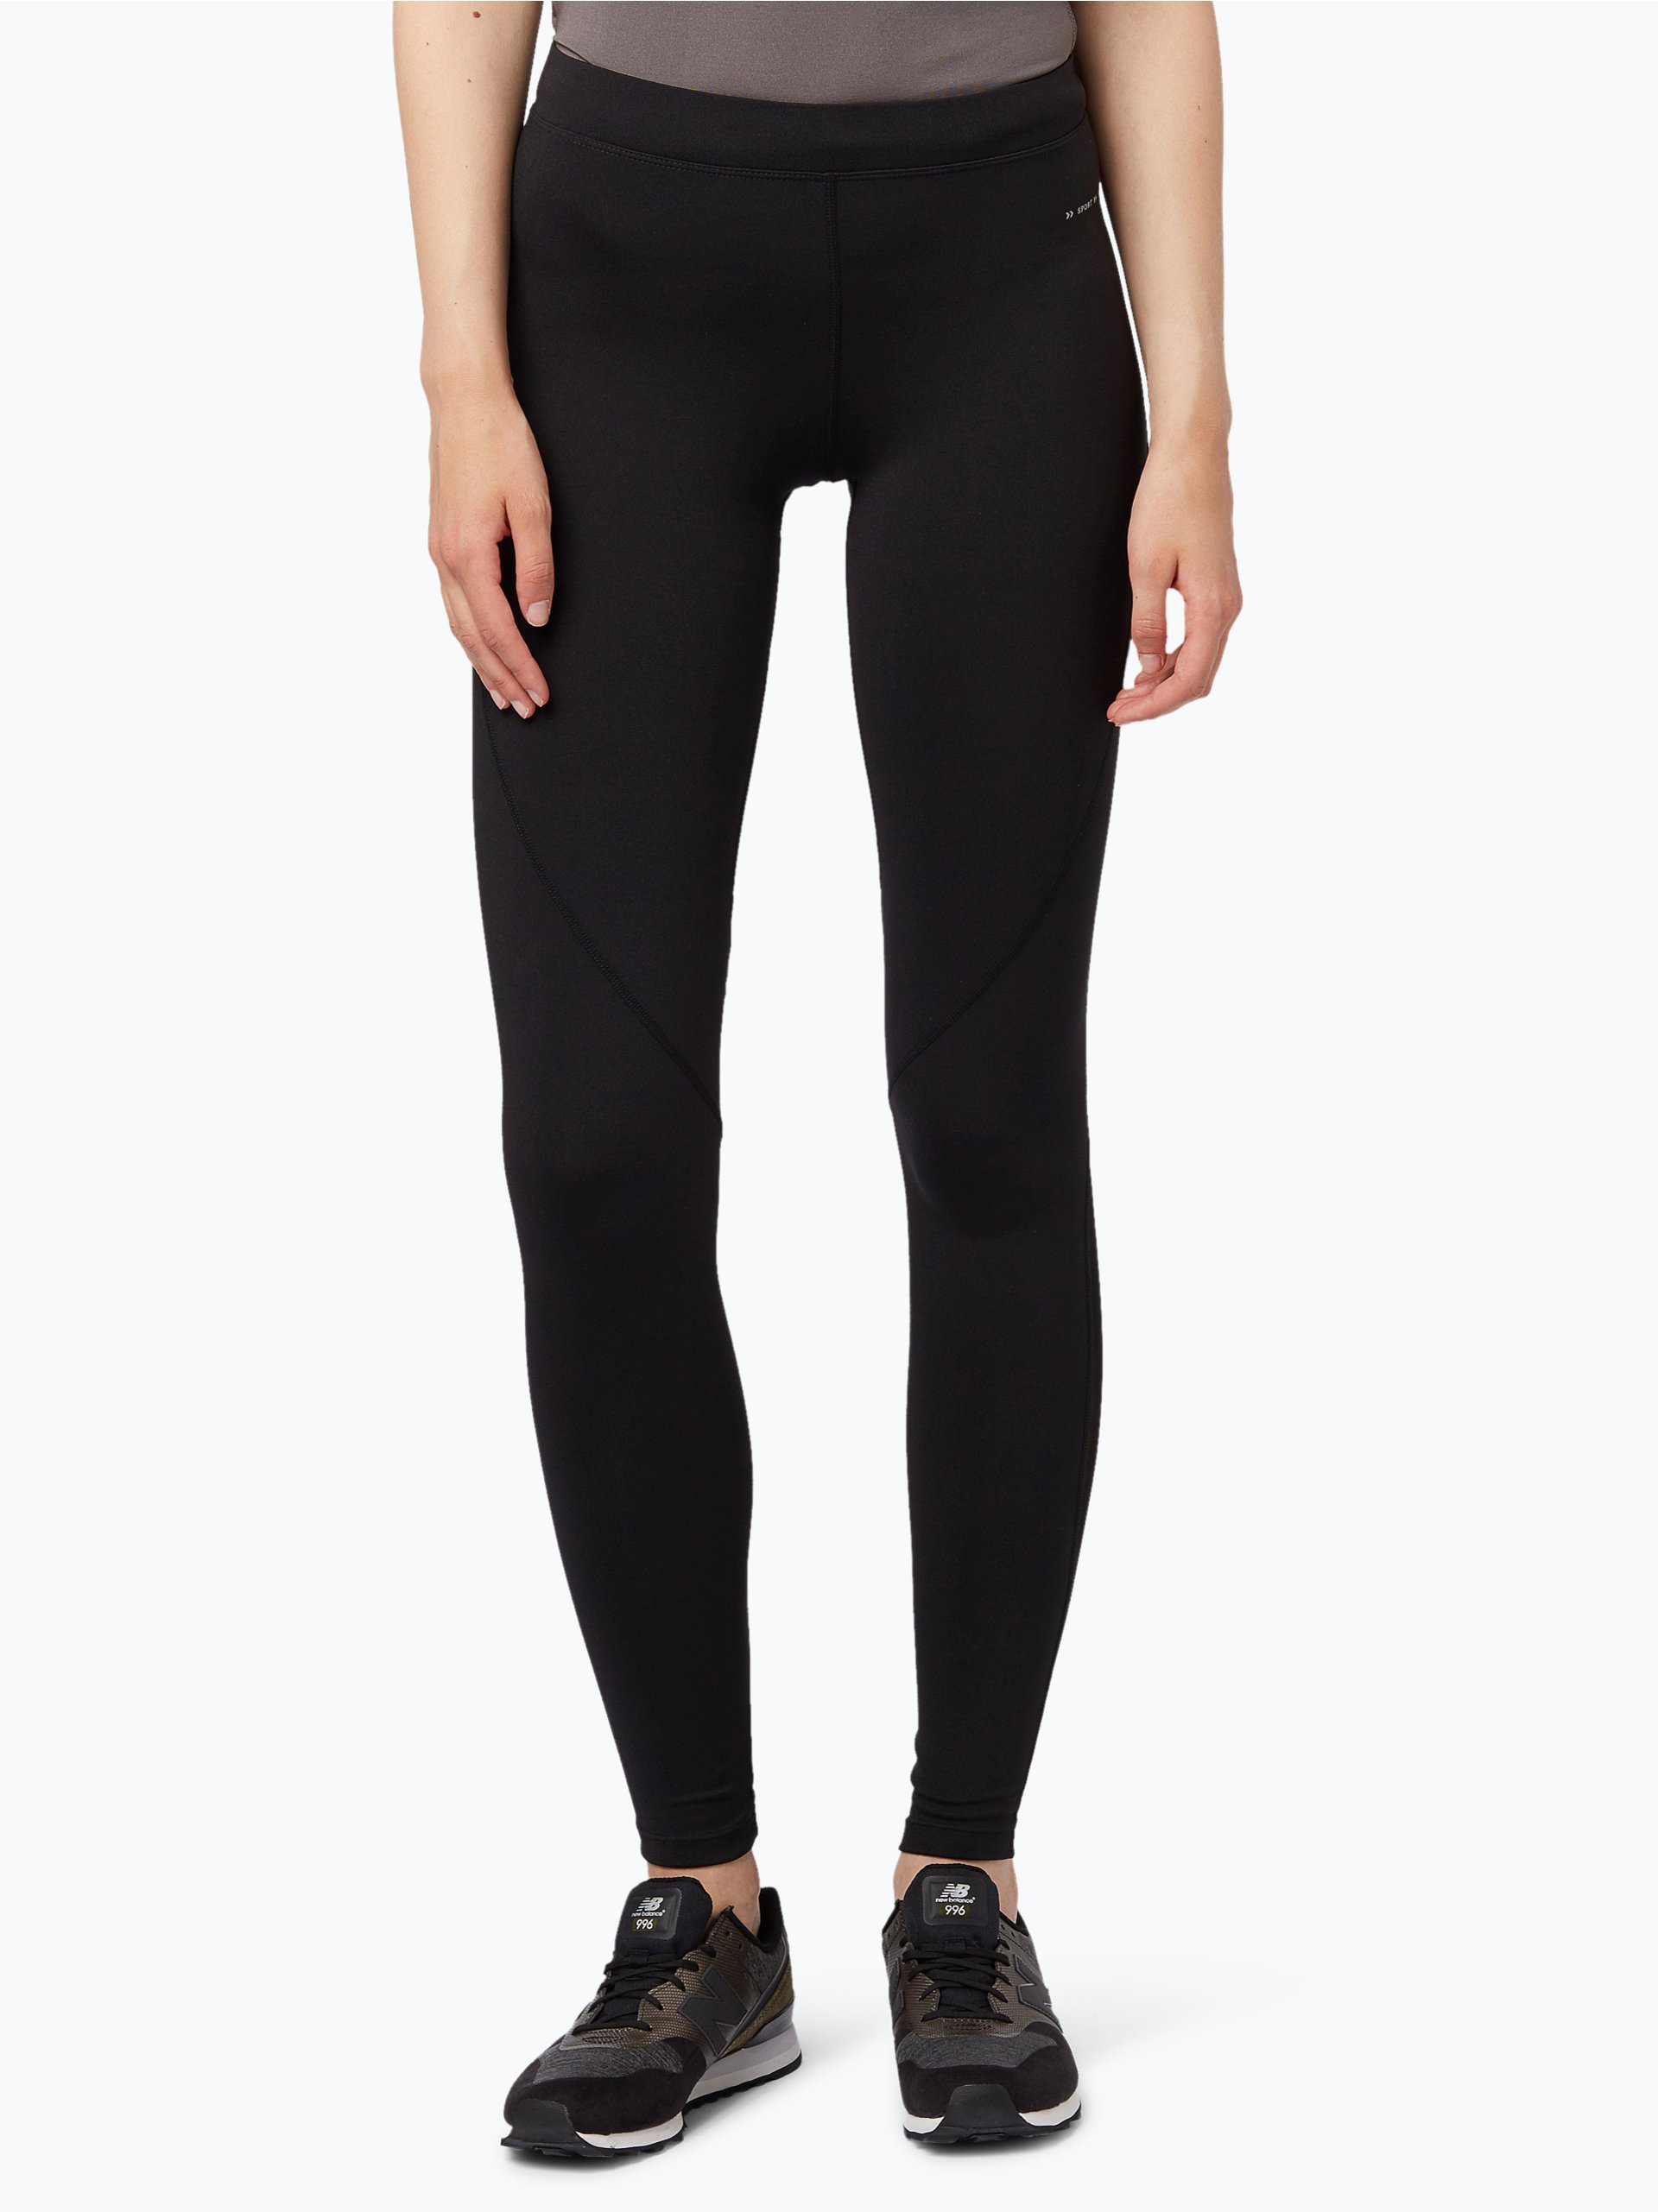 Marie Lund Sport Damen Sportswear Capri-Leggings